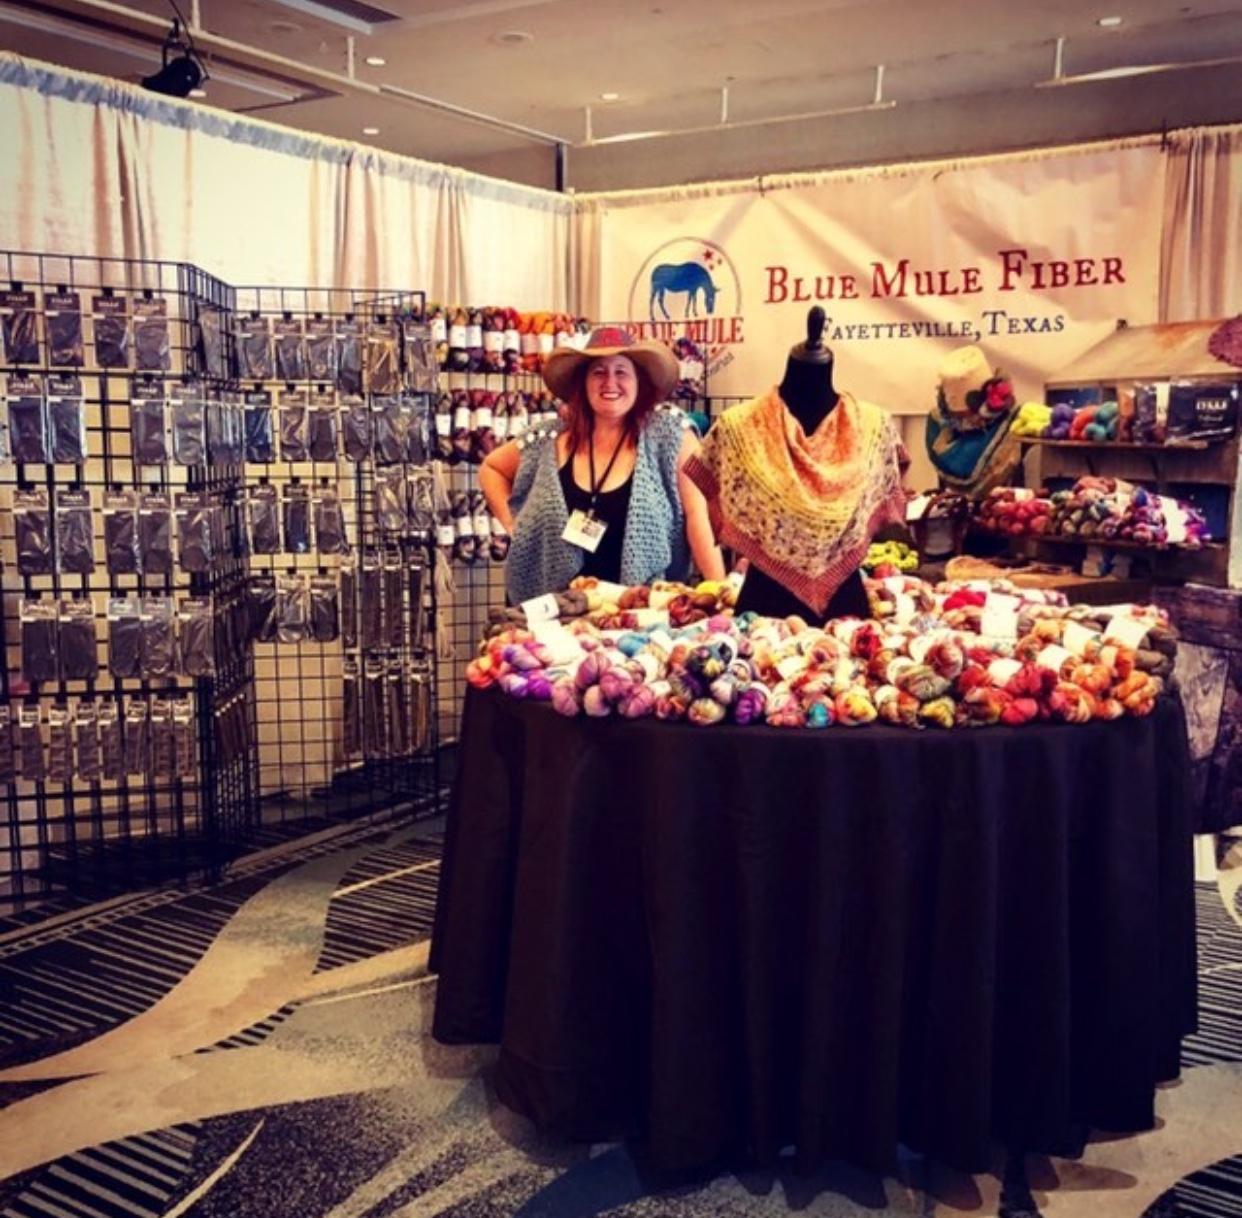 Yarn show with Blue Mule Fiber